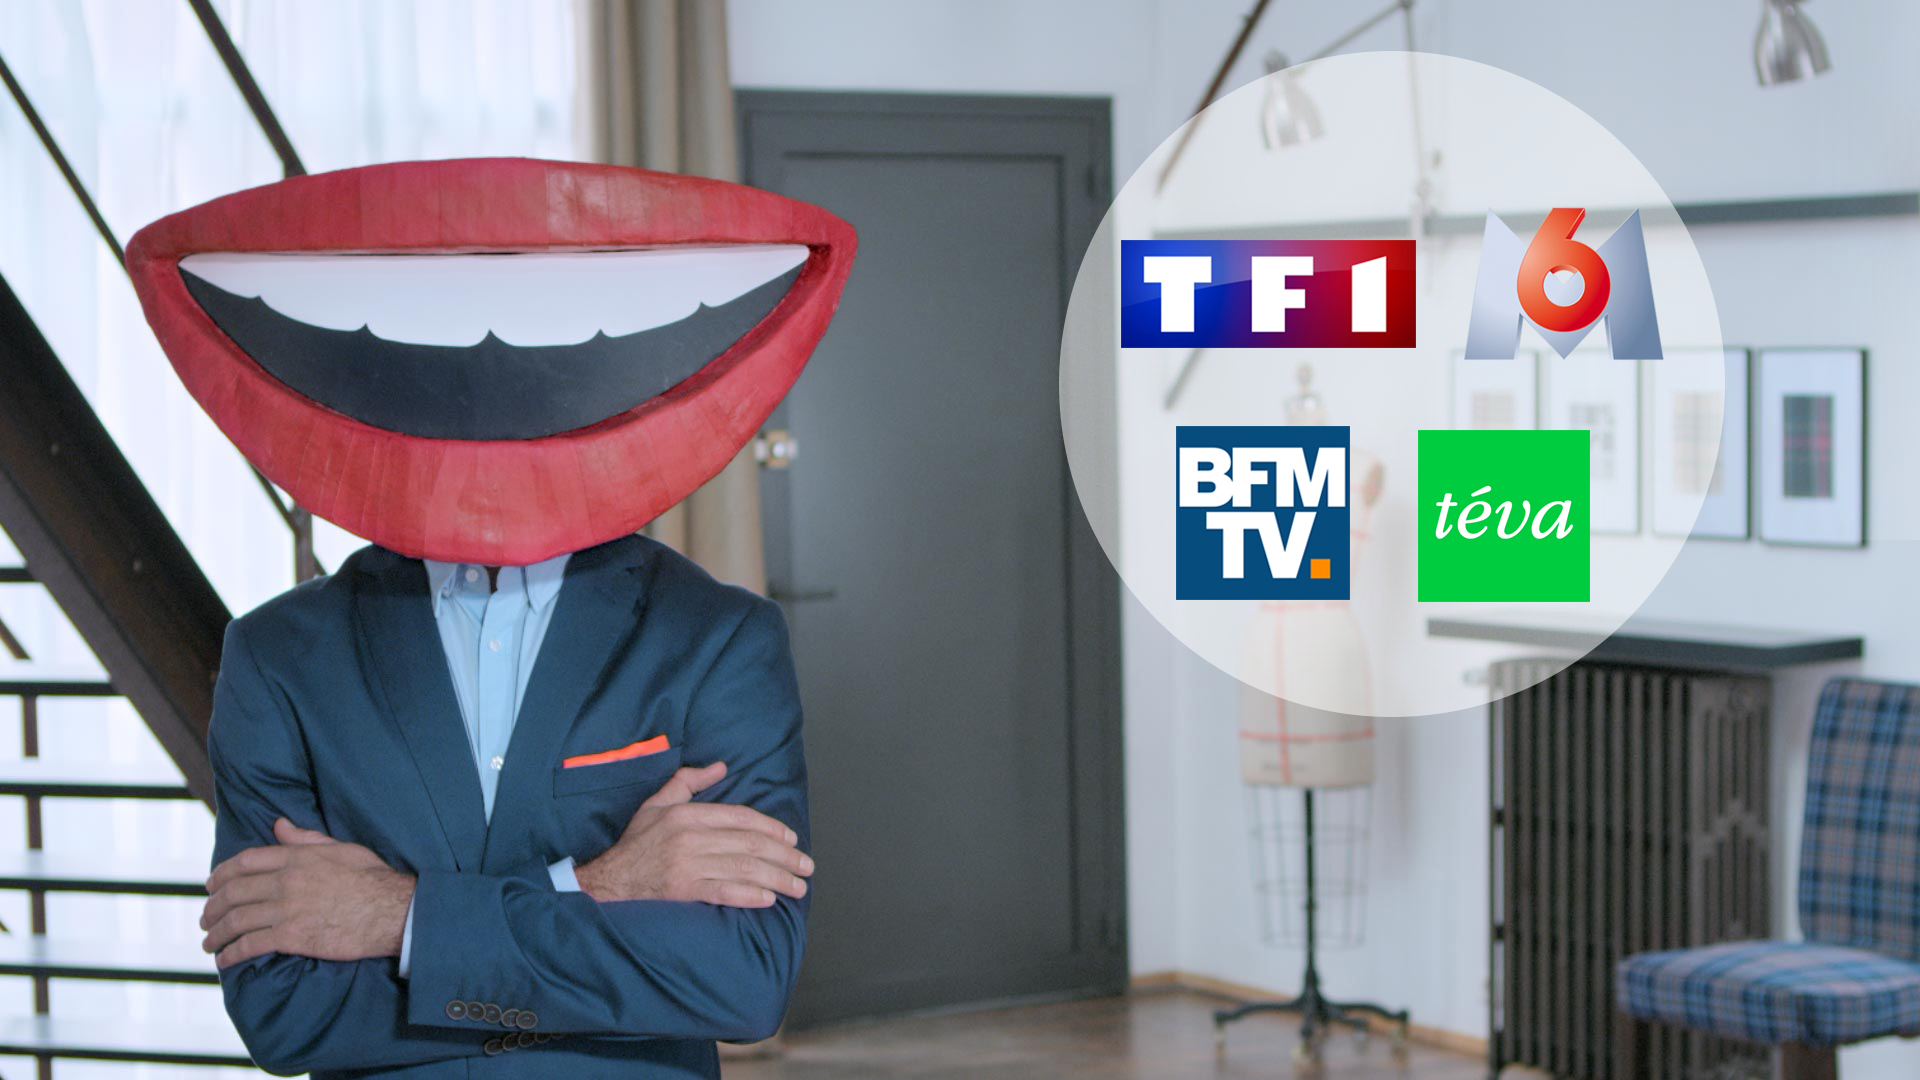 Campagne publicitaire SAFTI à la TV